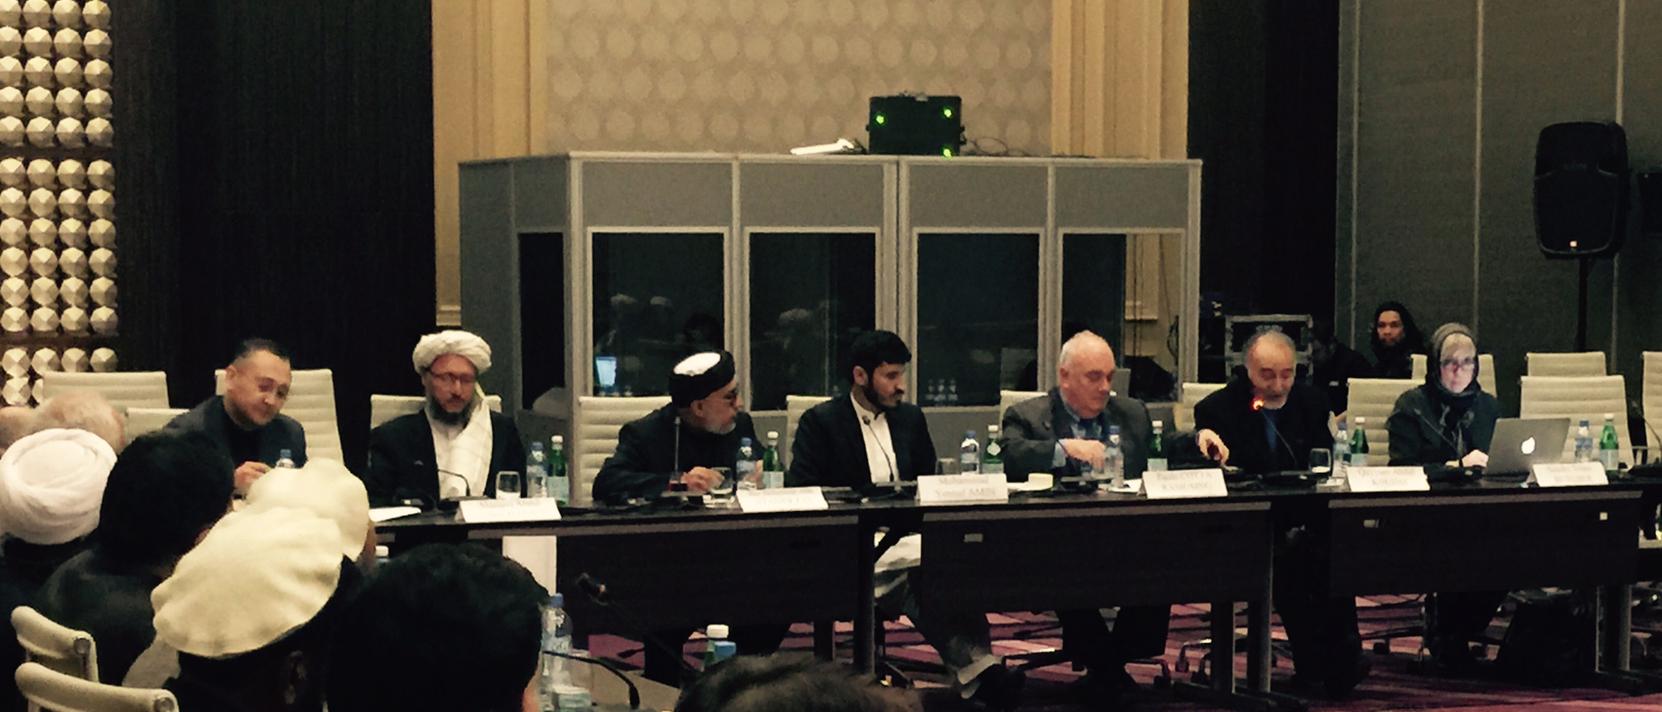 Doha meeting, January 2016